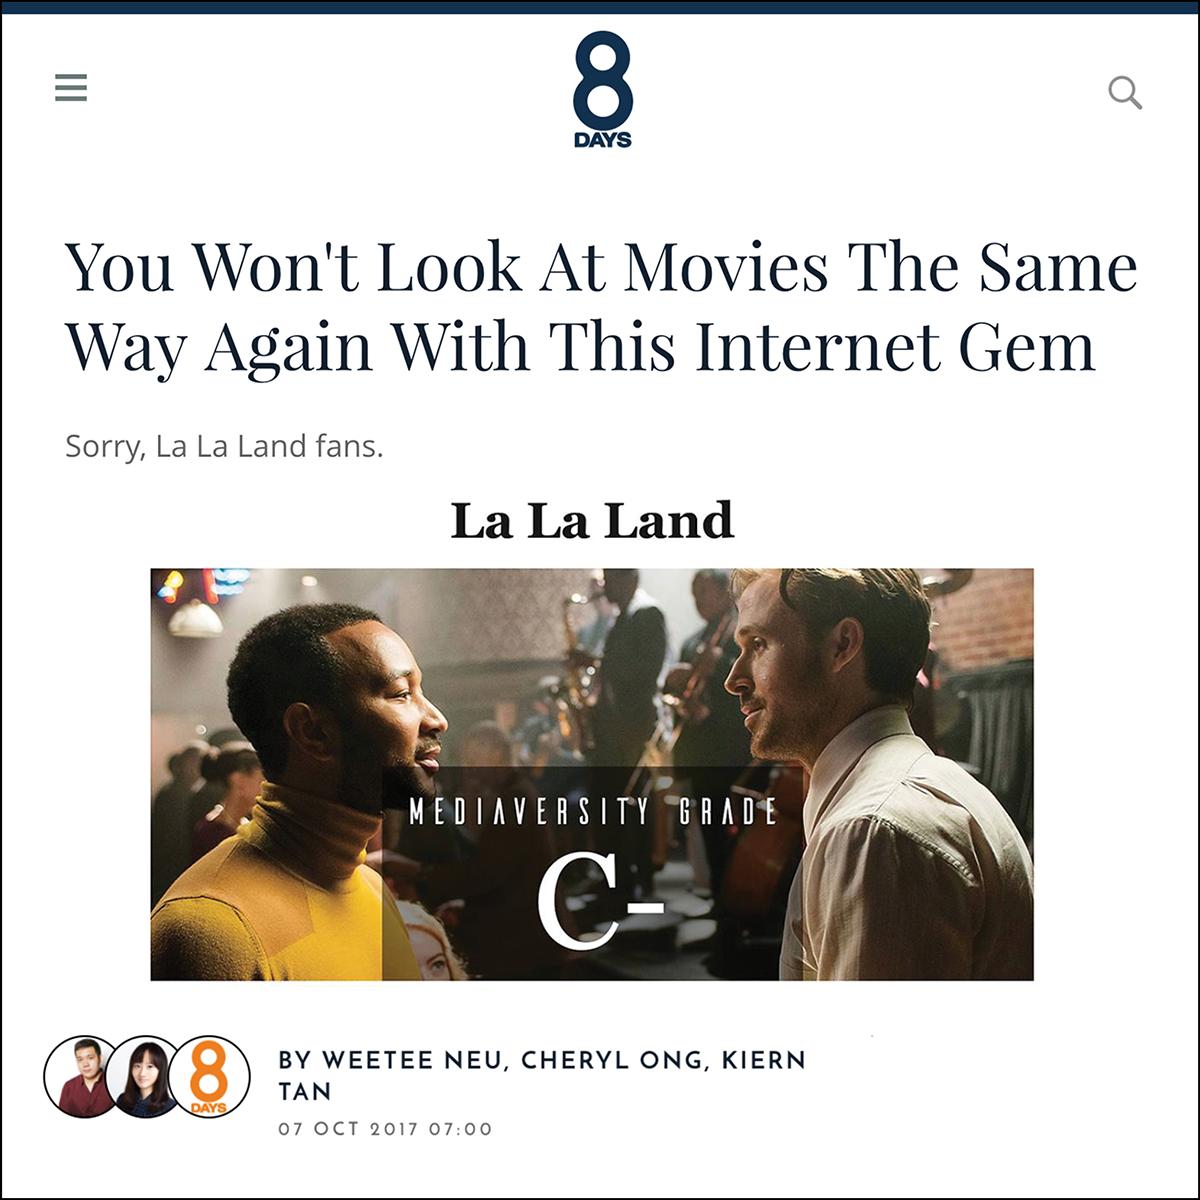 8 Days    Written by Weetee Neu, Cheryl Ong, and Kiern Tan, October 2017